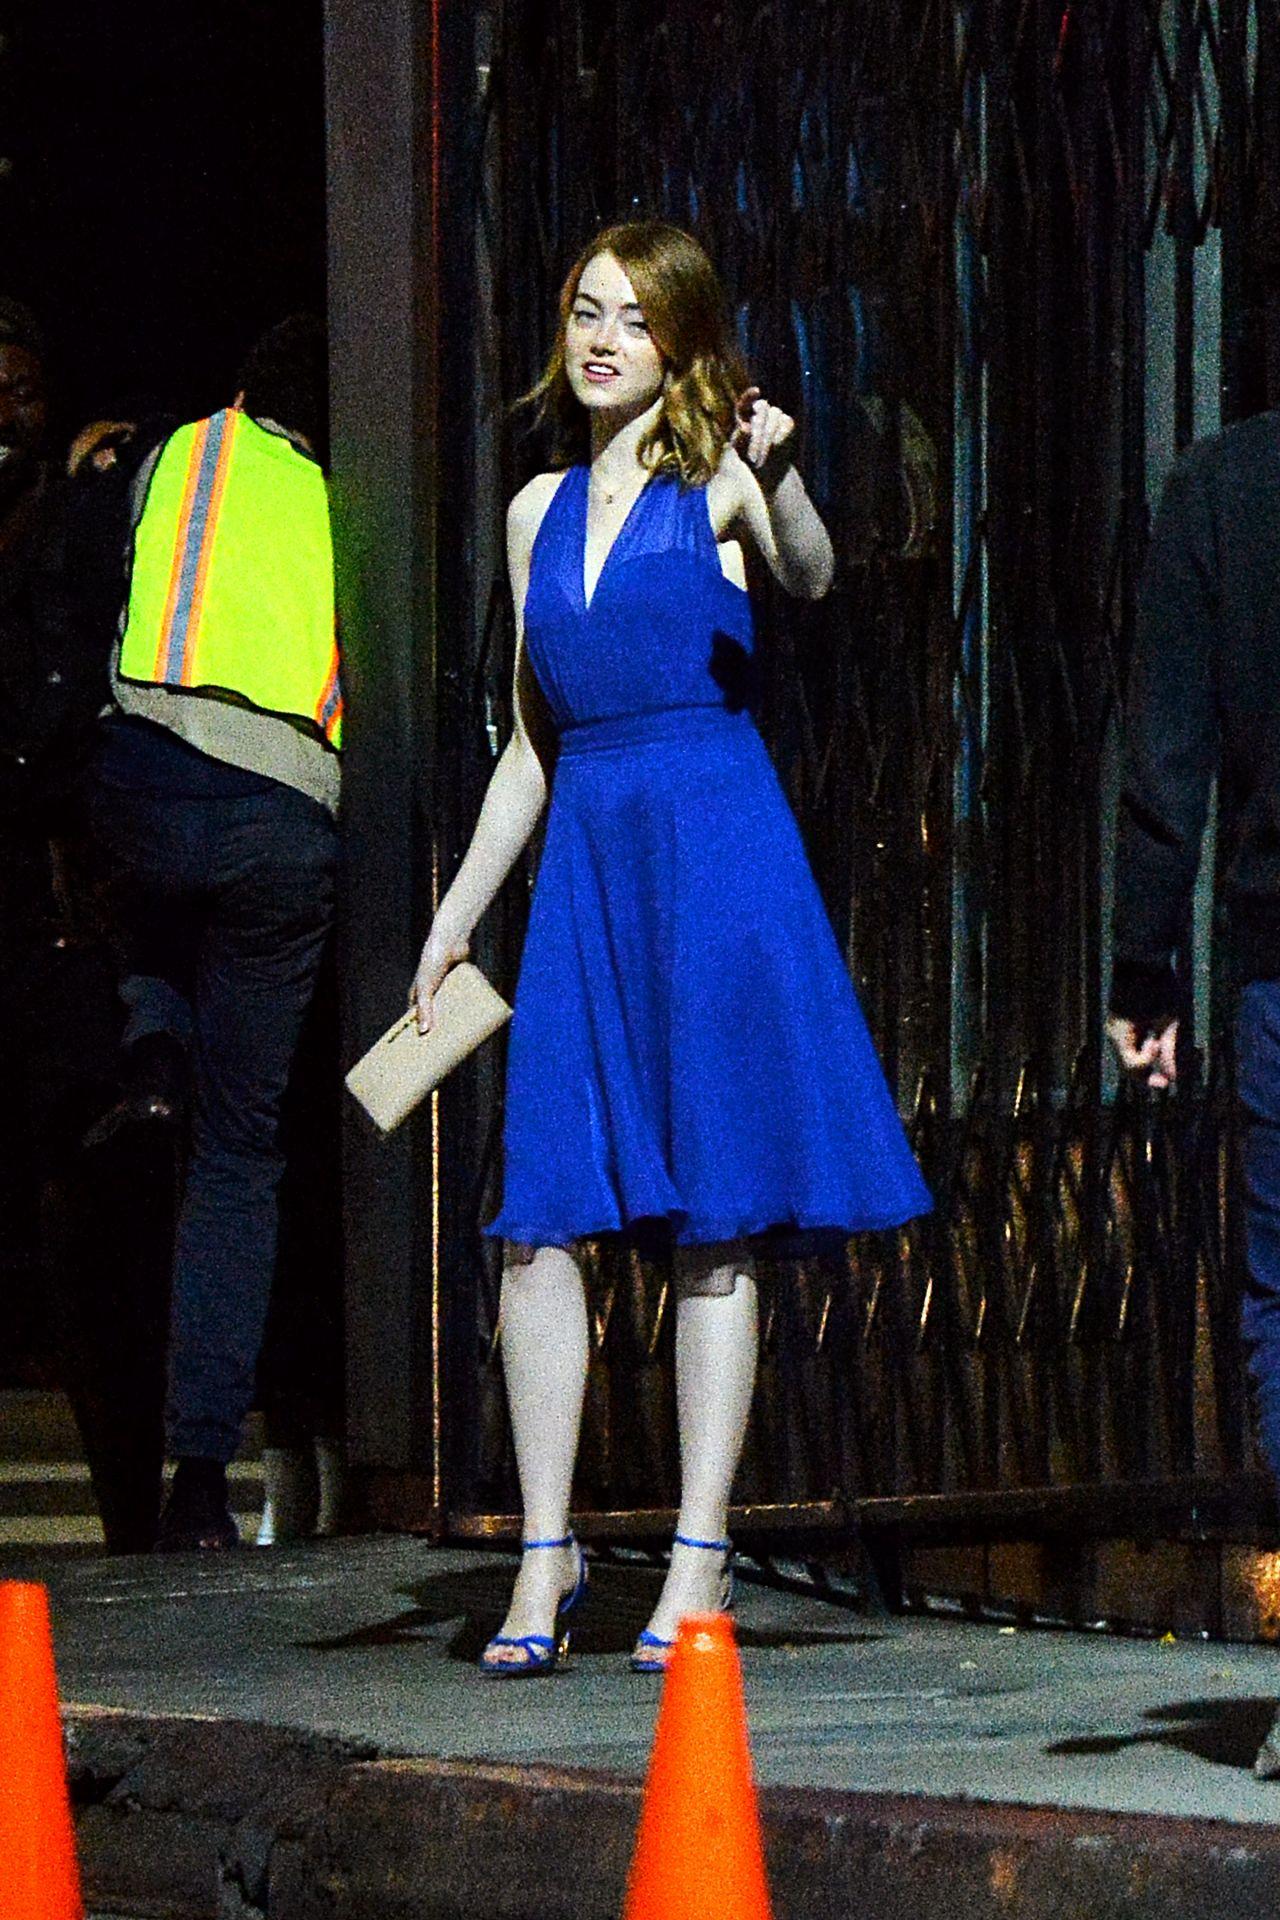 Rooney Mara Wallpaper Hd Emma Stone La La Land Set In Hollywood October 2015